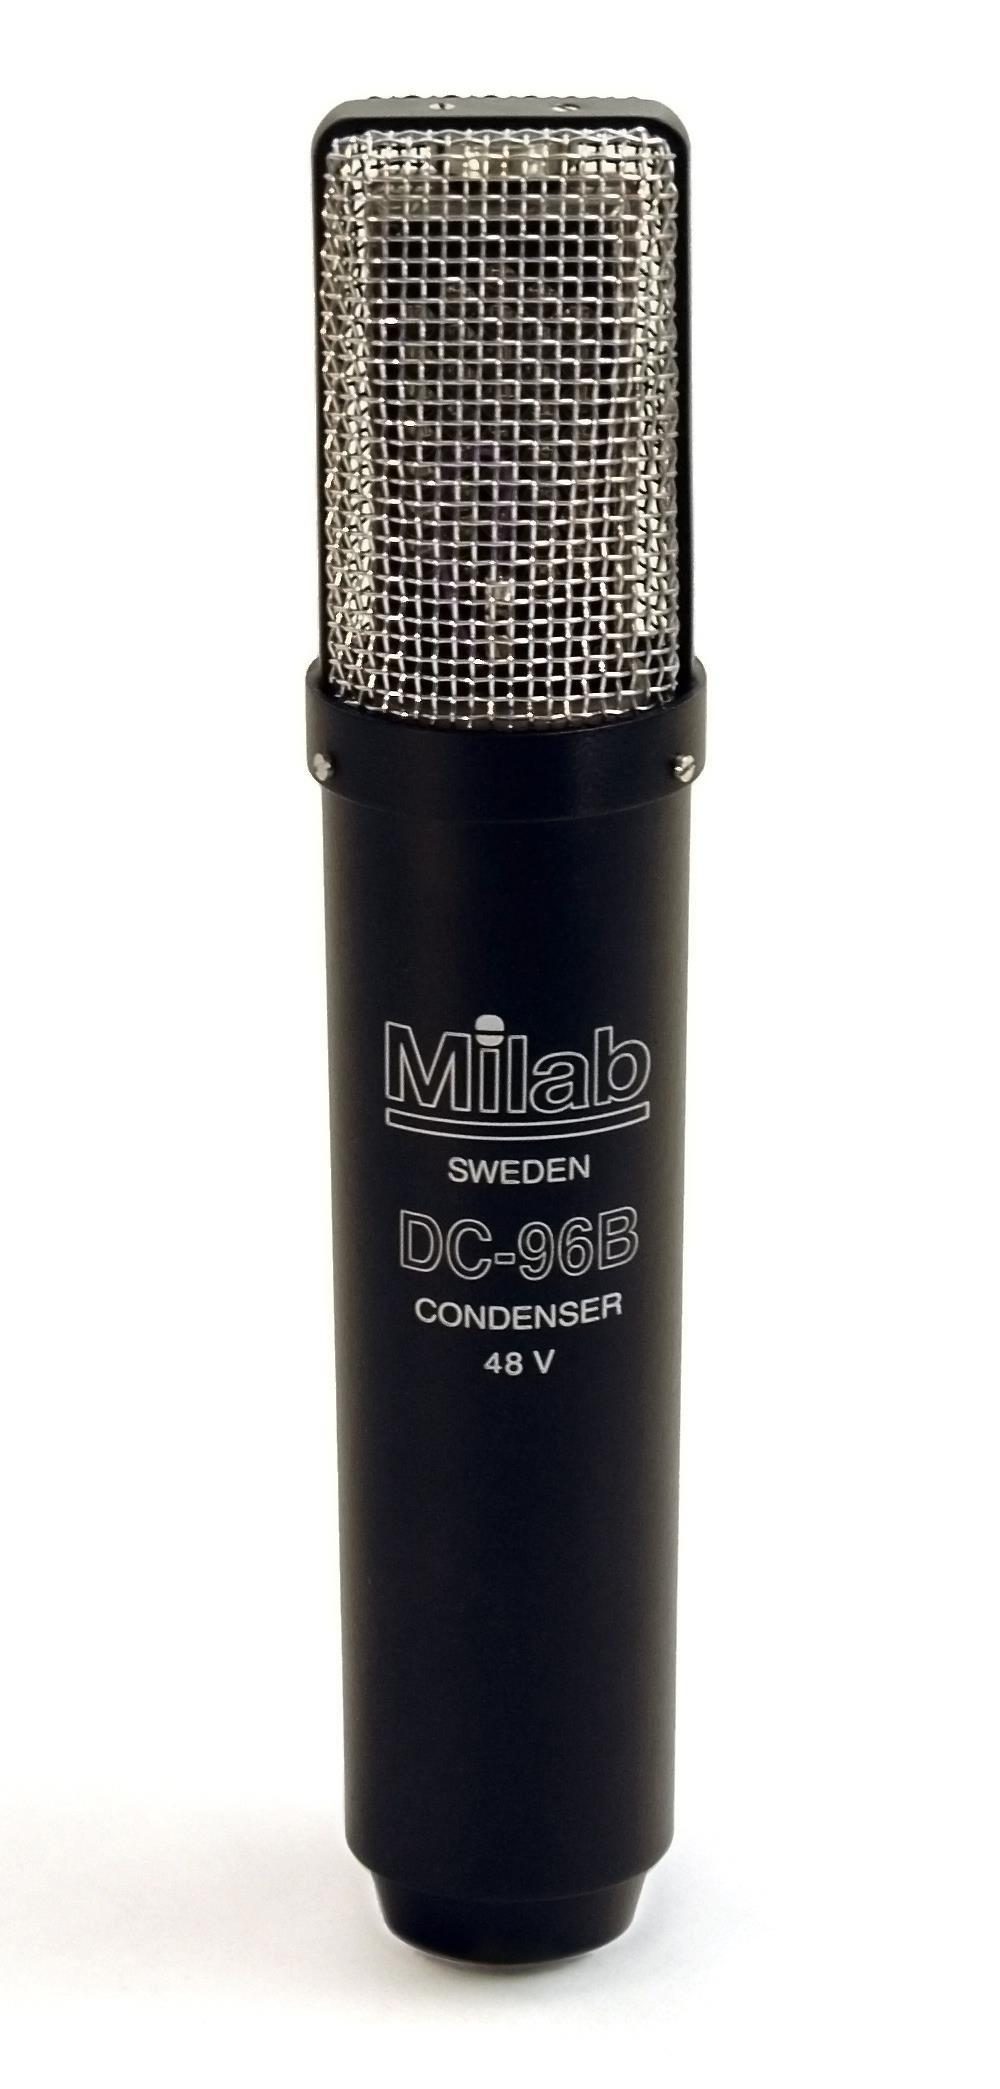 MILAB kondensator mik kardioide sort lakkert